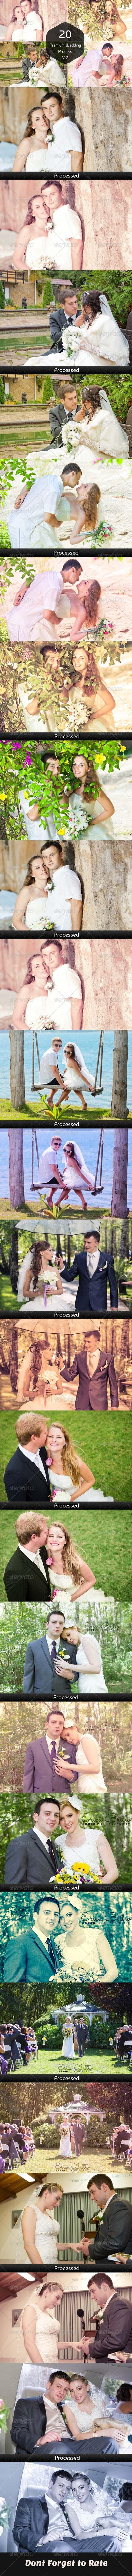 GraphicRiver 20 Wedding Photography Pro V-2 Lightroom Presets 7852754